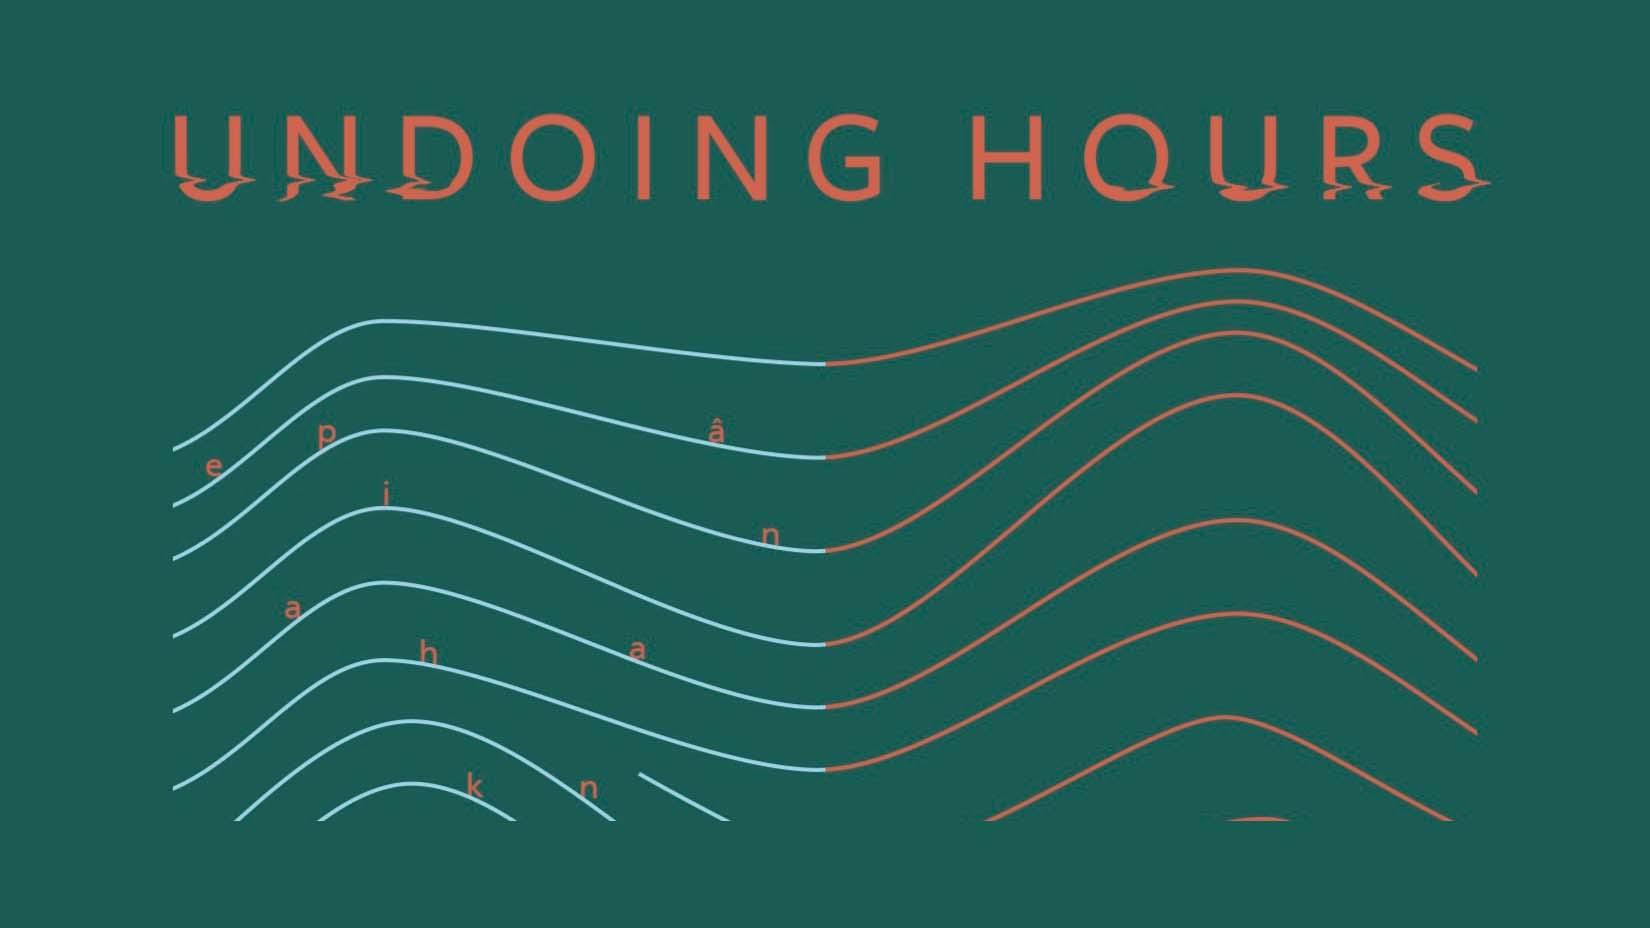 Undoing Hours